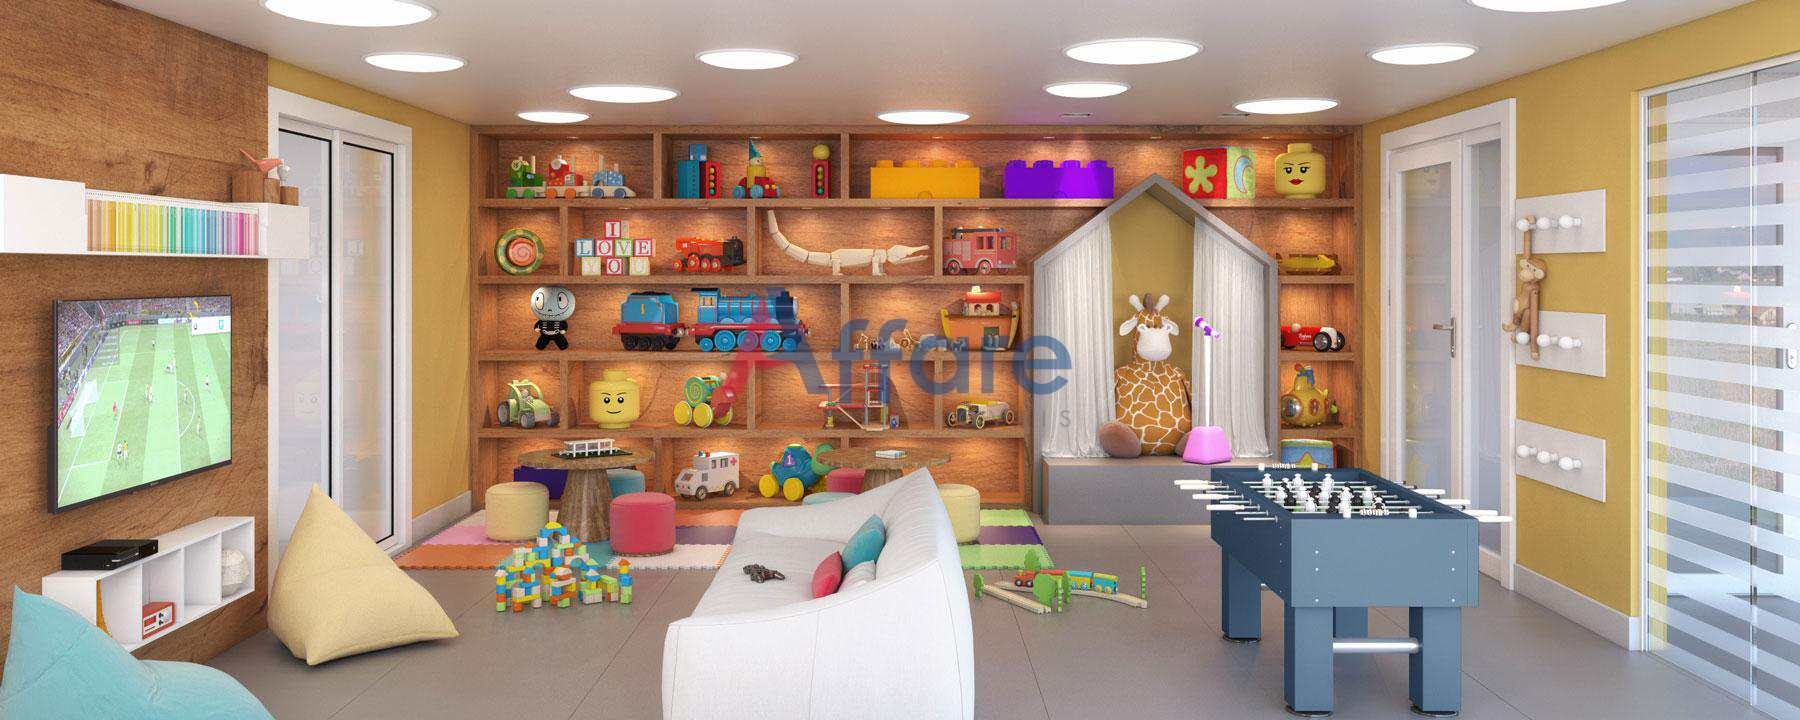 T2A_Astrum_Kids_R03